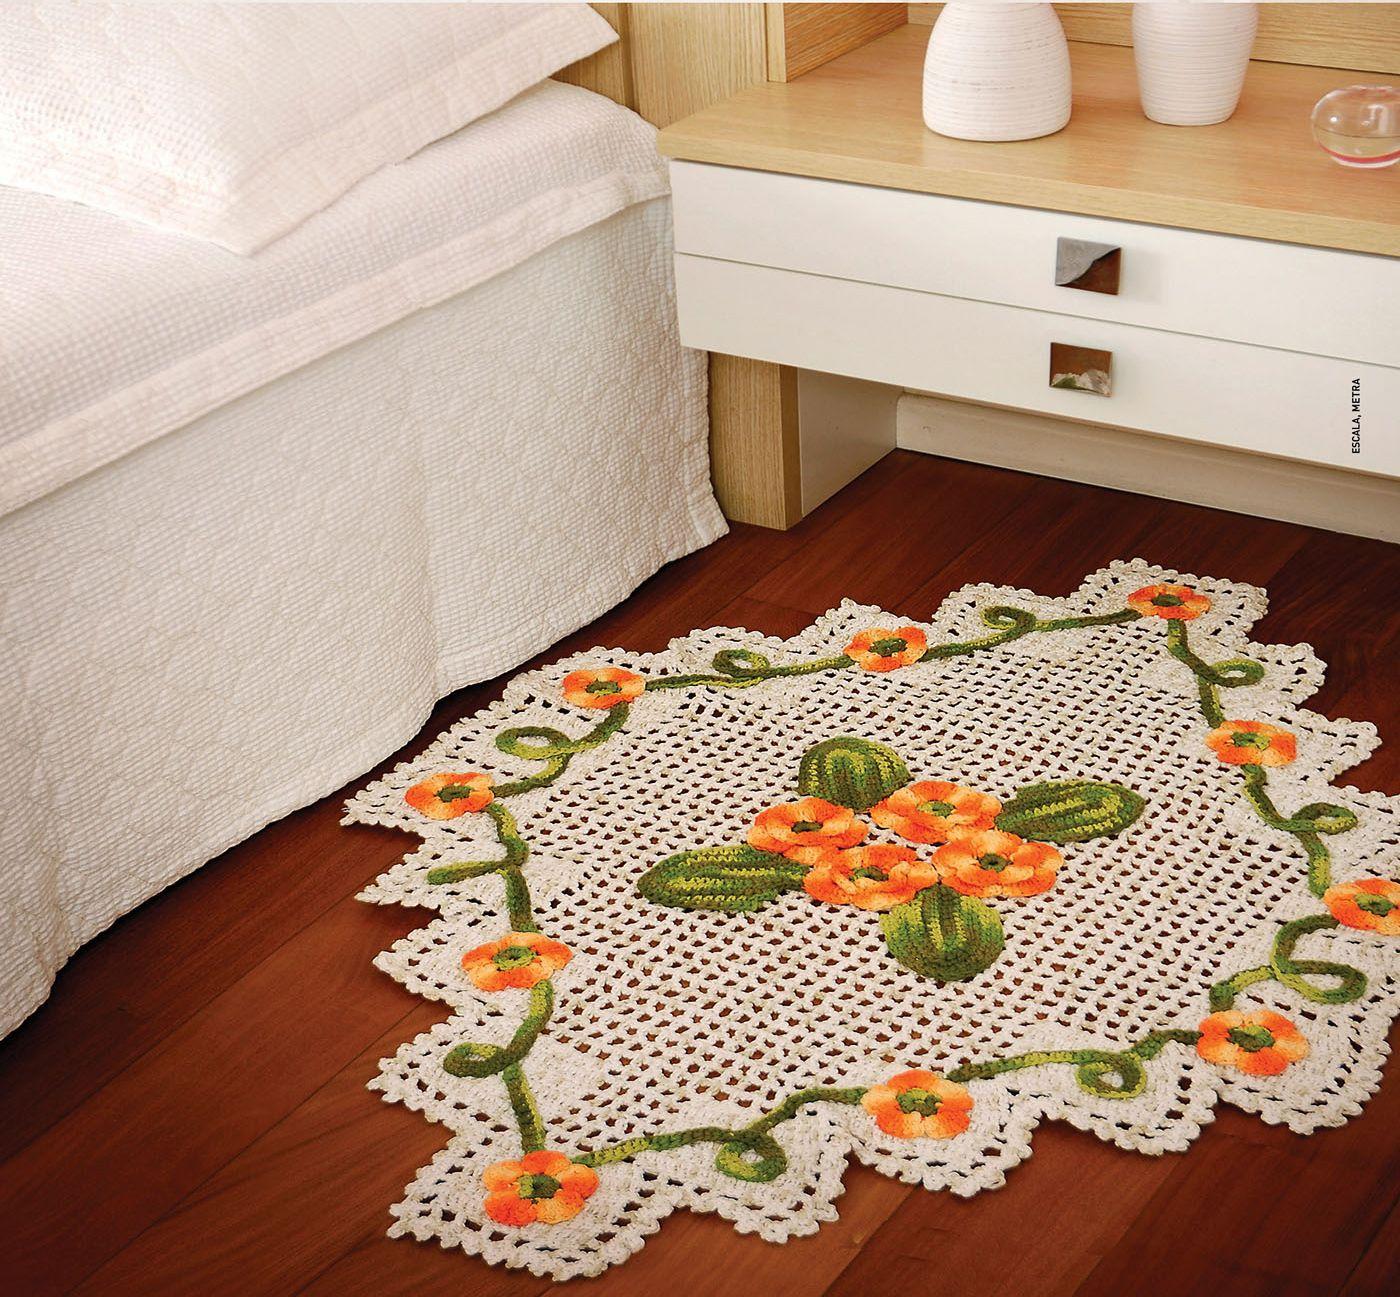 As Receitas De Croch Tapete De Croch Com Fio Barroco Tapetes  -> Oasis Tapetes